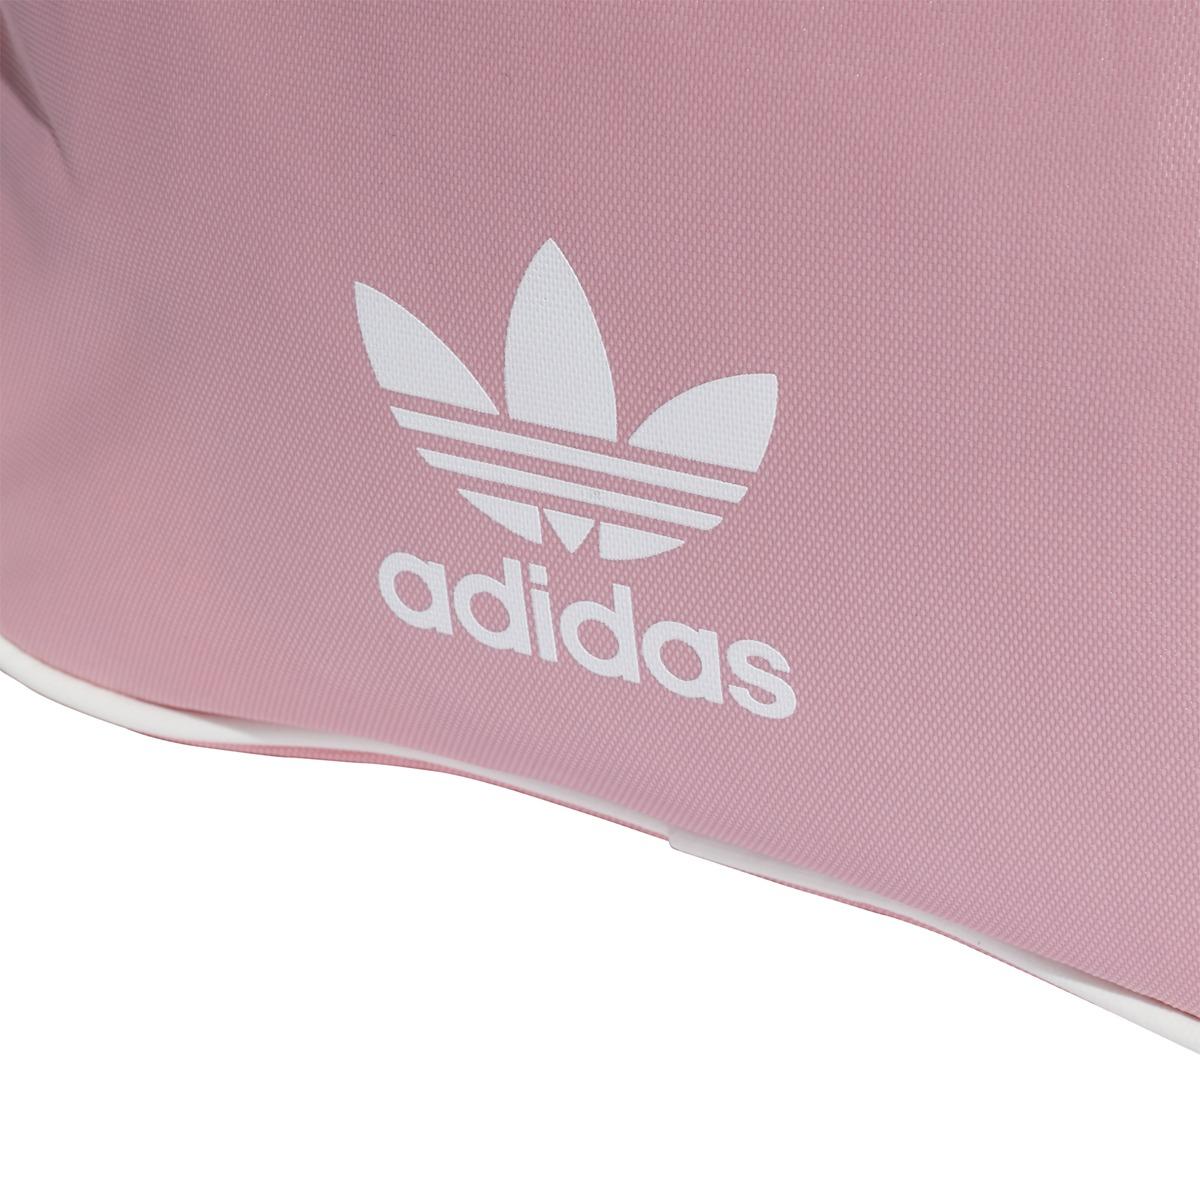 6fd1b11423 mochila adidas originals moda classic adicolor mujer rs bl. Cargando  zoom... mochila adidas mujer. Cargando zoom.